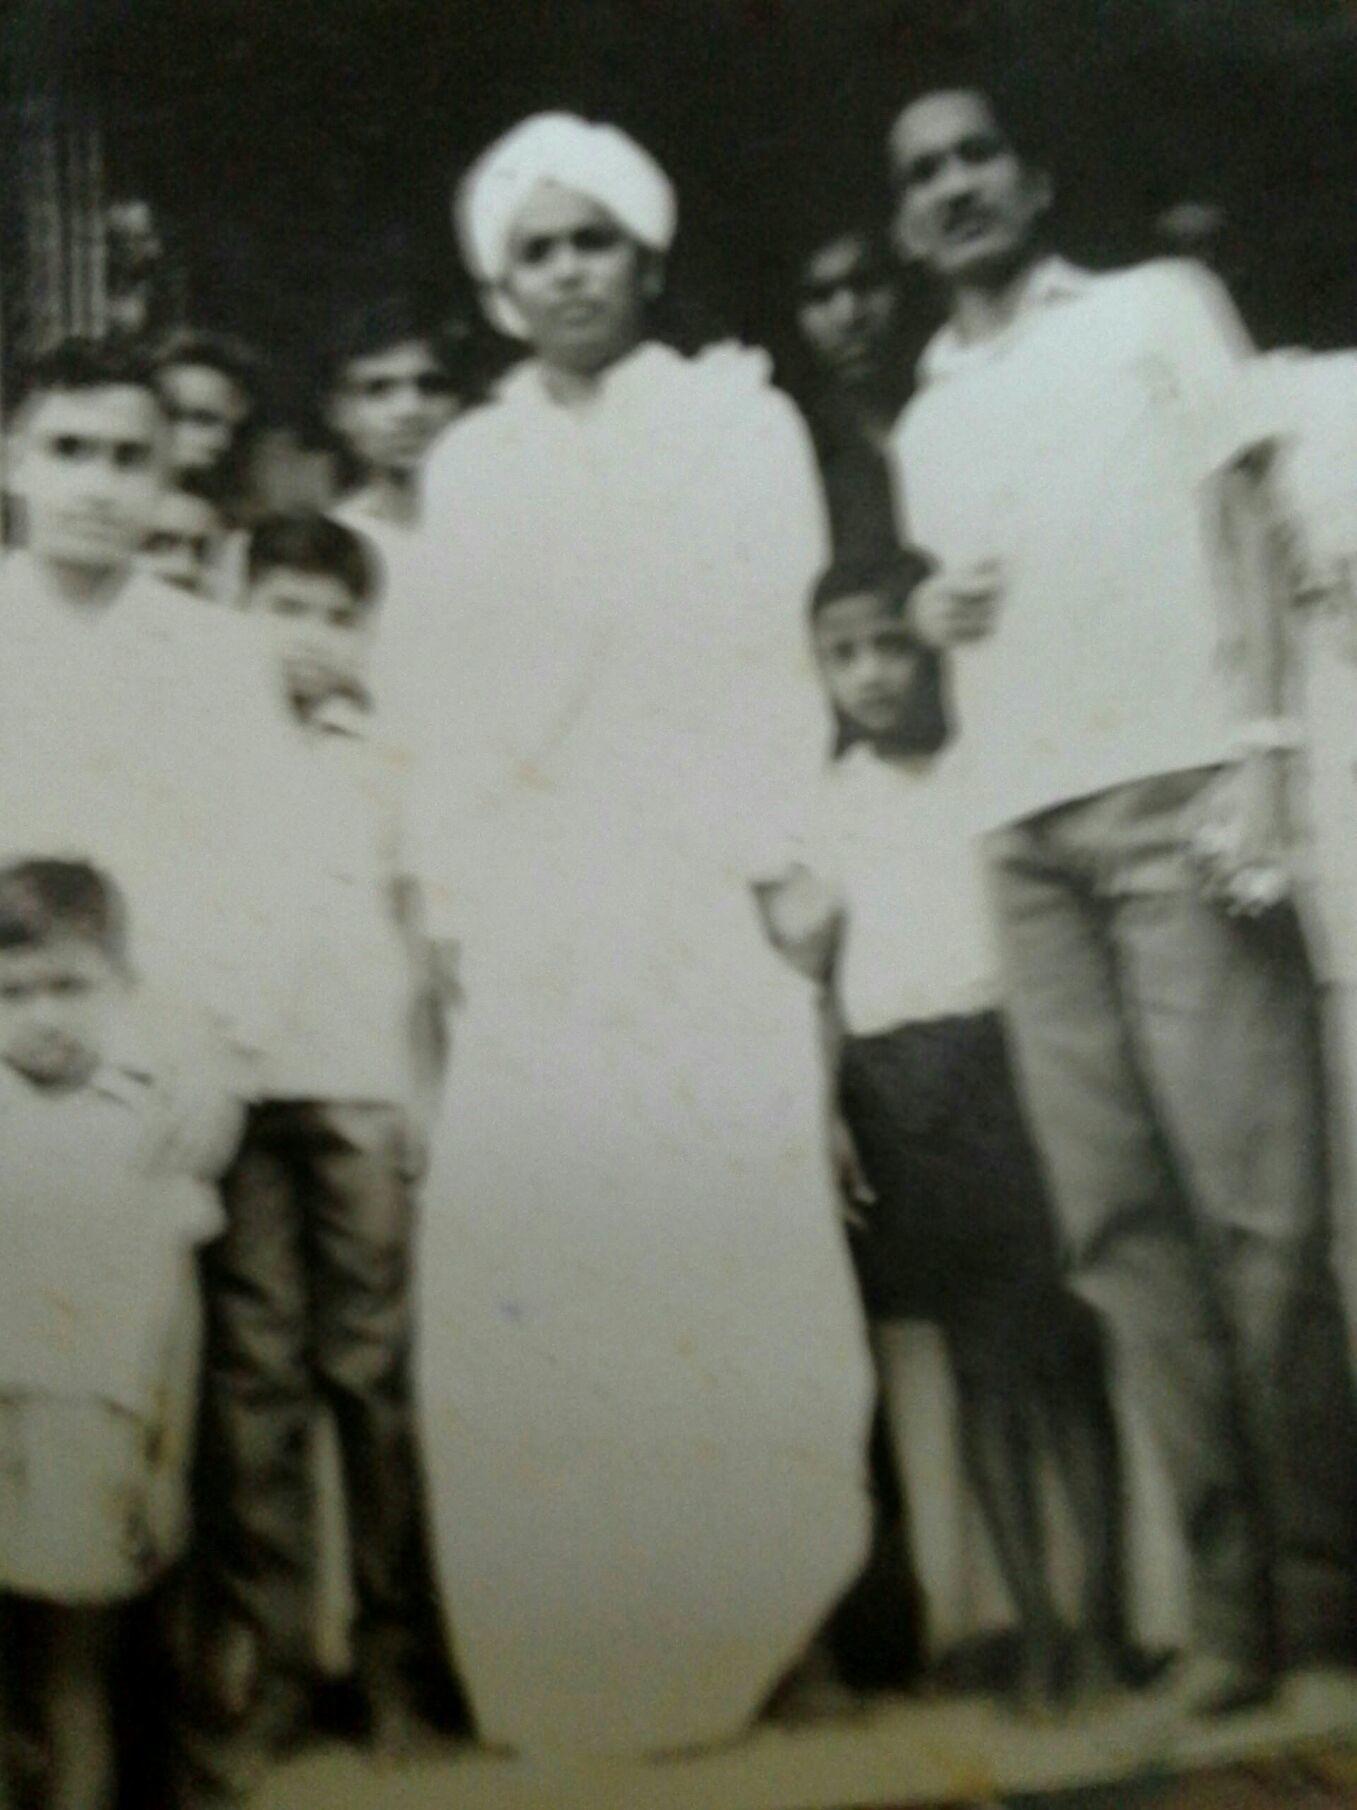 black & white photo from old album